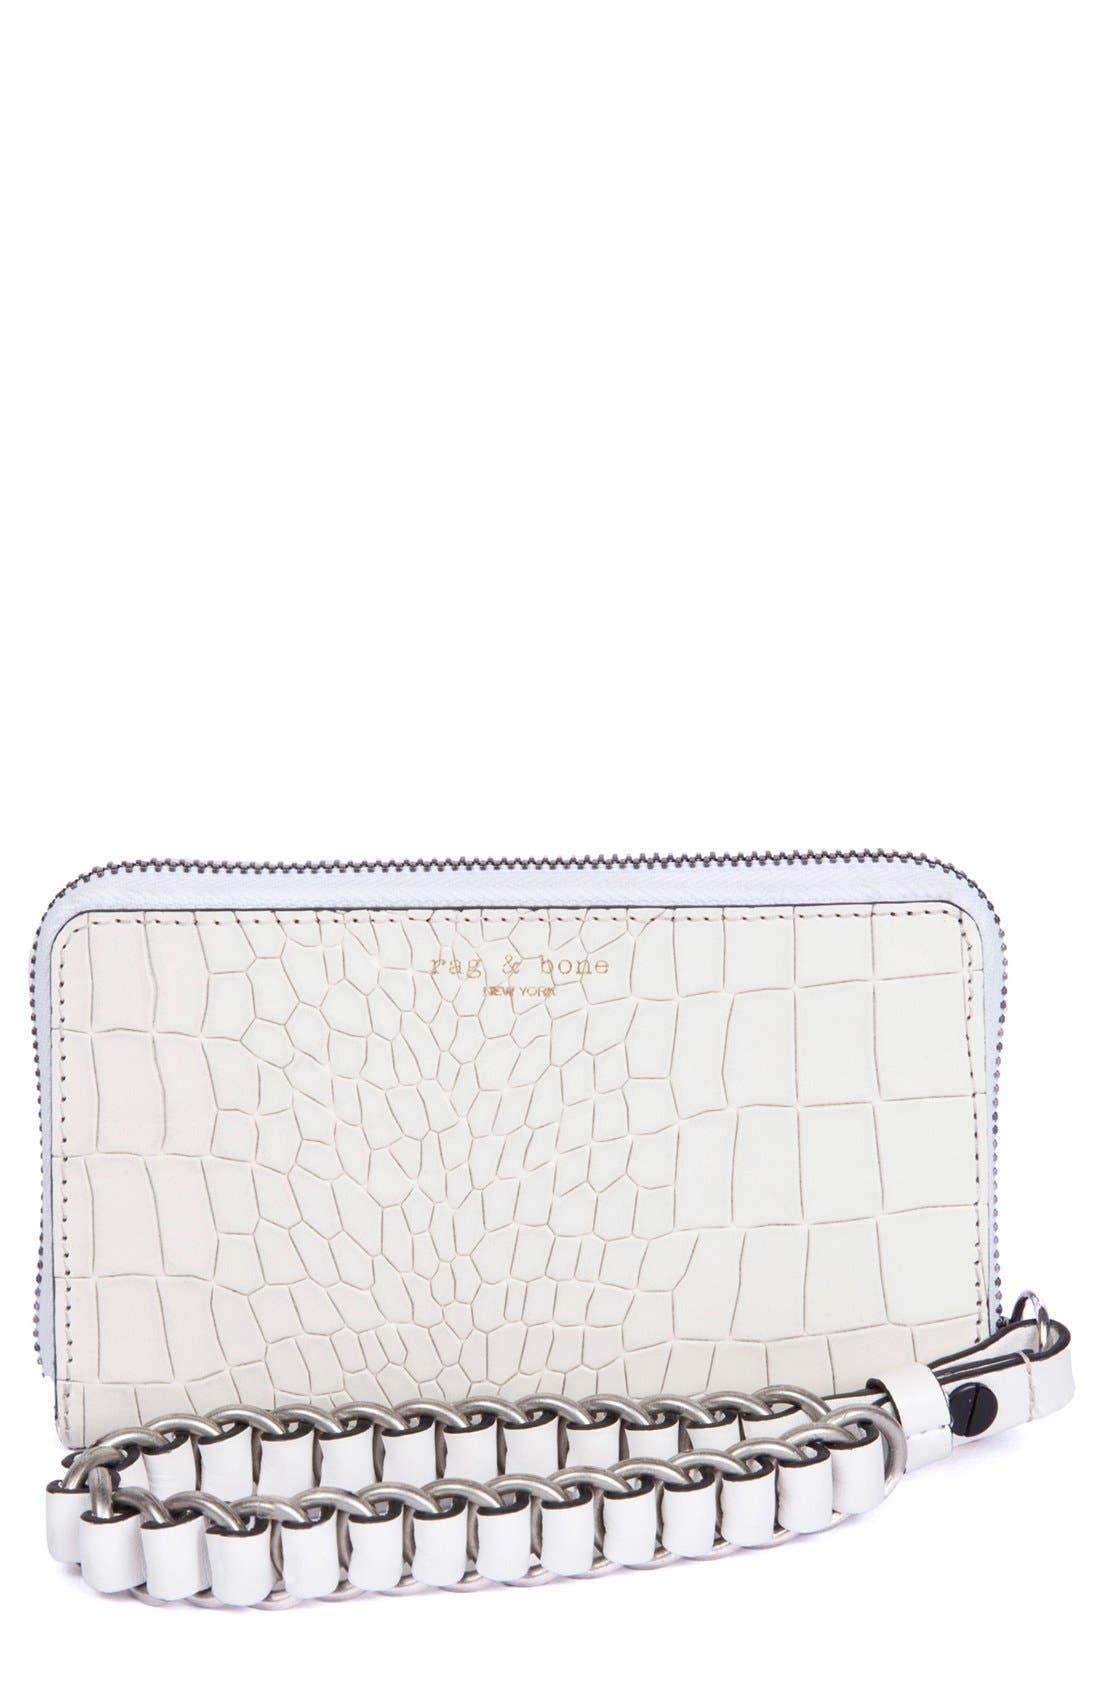 Alternate Image 1 Selected - rag & bone 'Devon' Mobile Zip Wallet